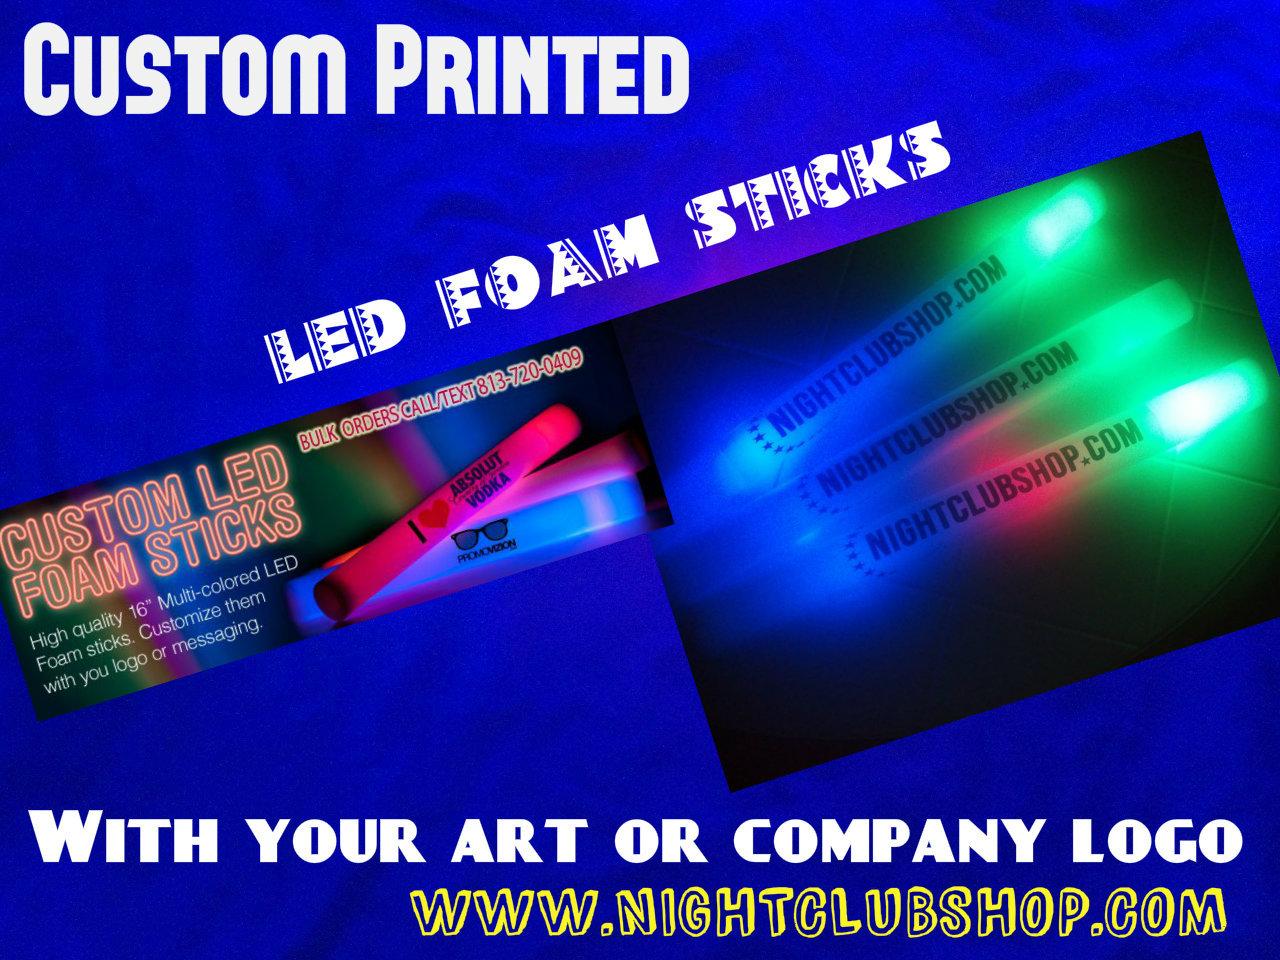 noodles-led-foam-stick-custom-led-foam-sticks-custom-print-nightclub-free-color-print-printing-custom-lumiton.jpg